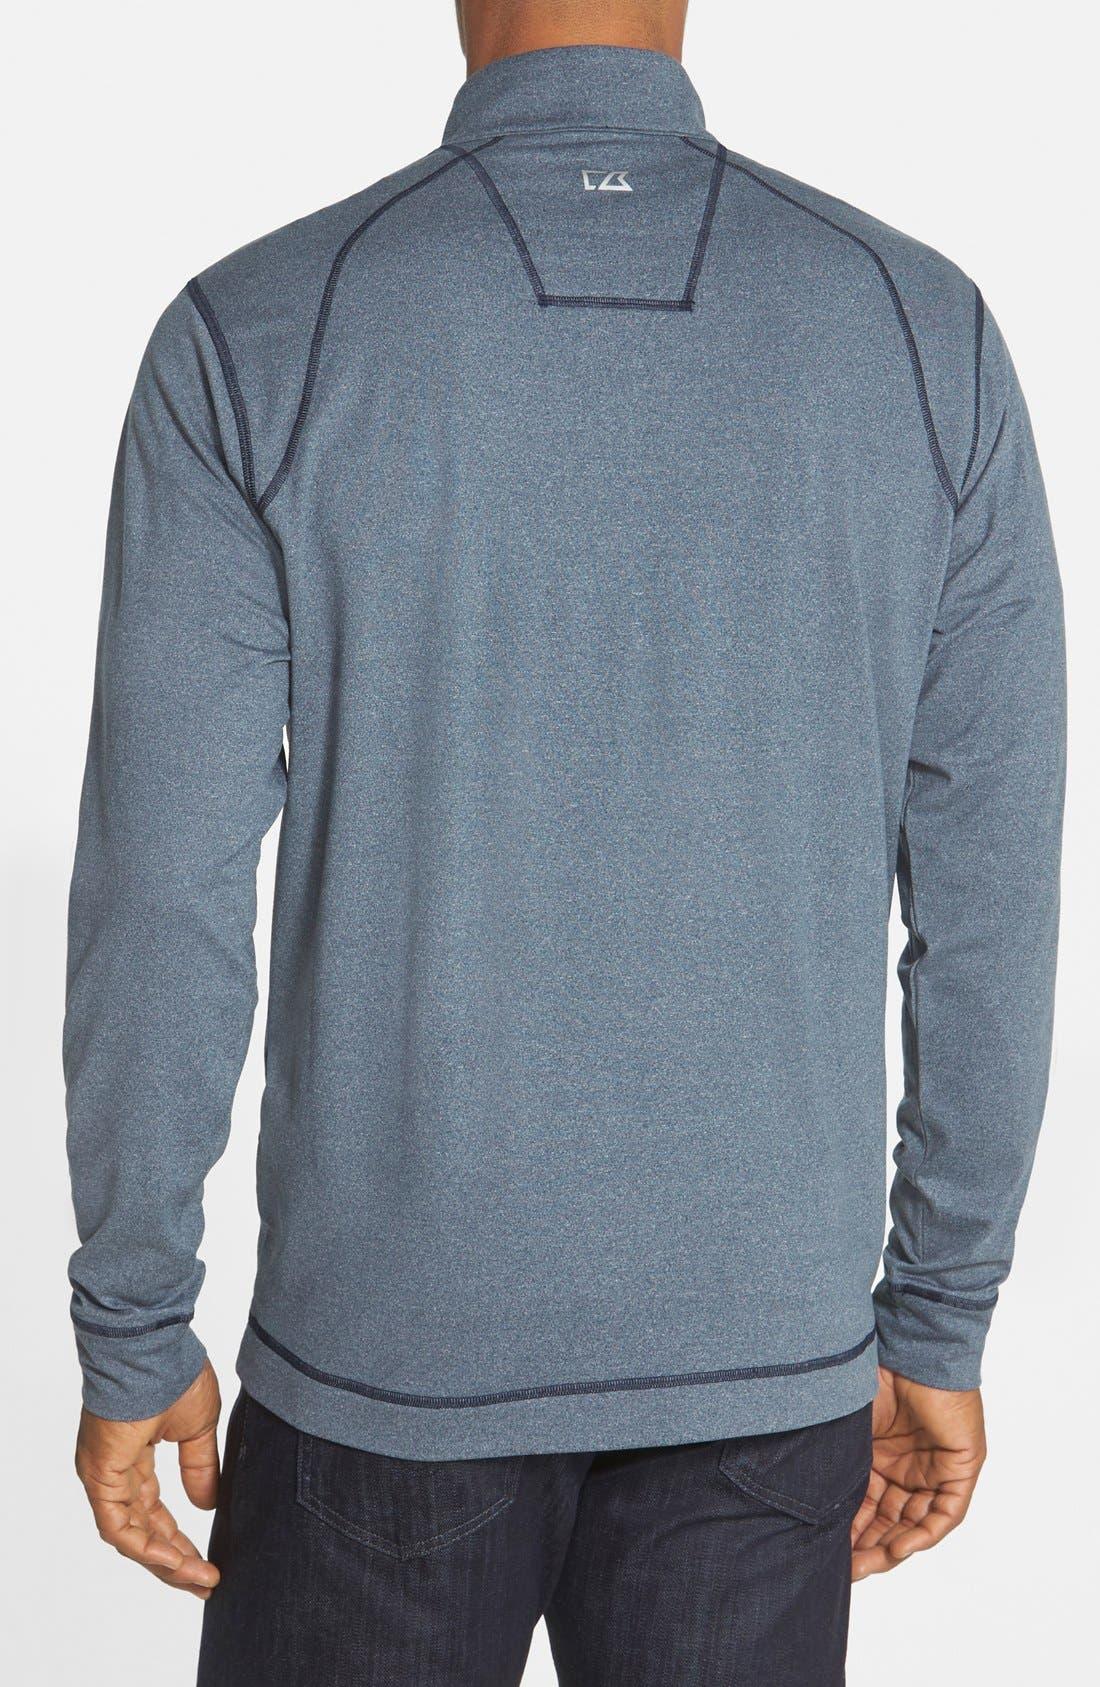 CUTTER & BUCK,                             'Topspin' DryTec Half Zip Pullover,                             Alternate thumbnail 3, color,                             NAVY HEATHER